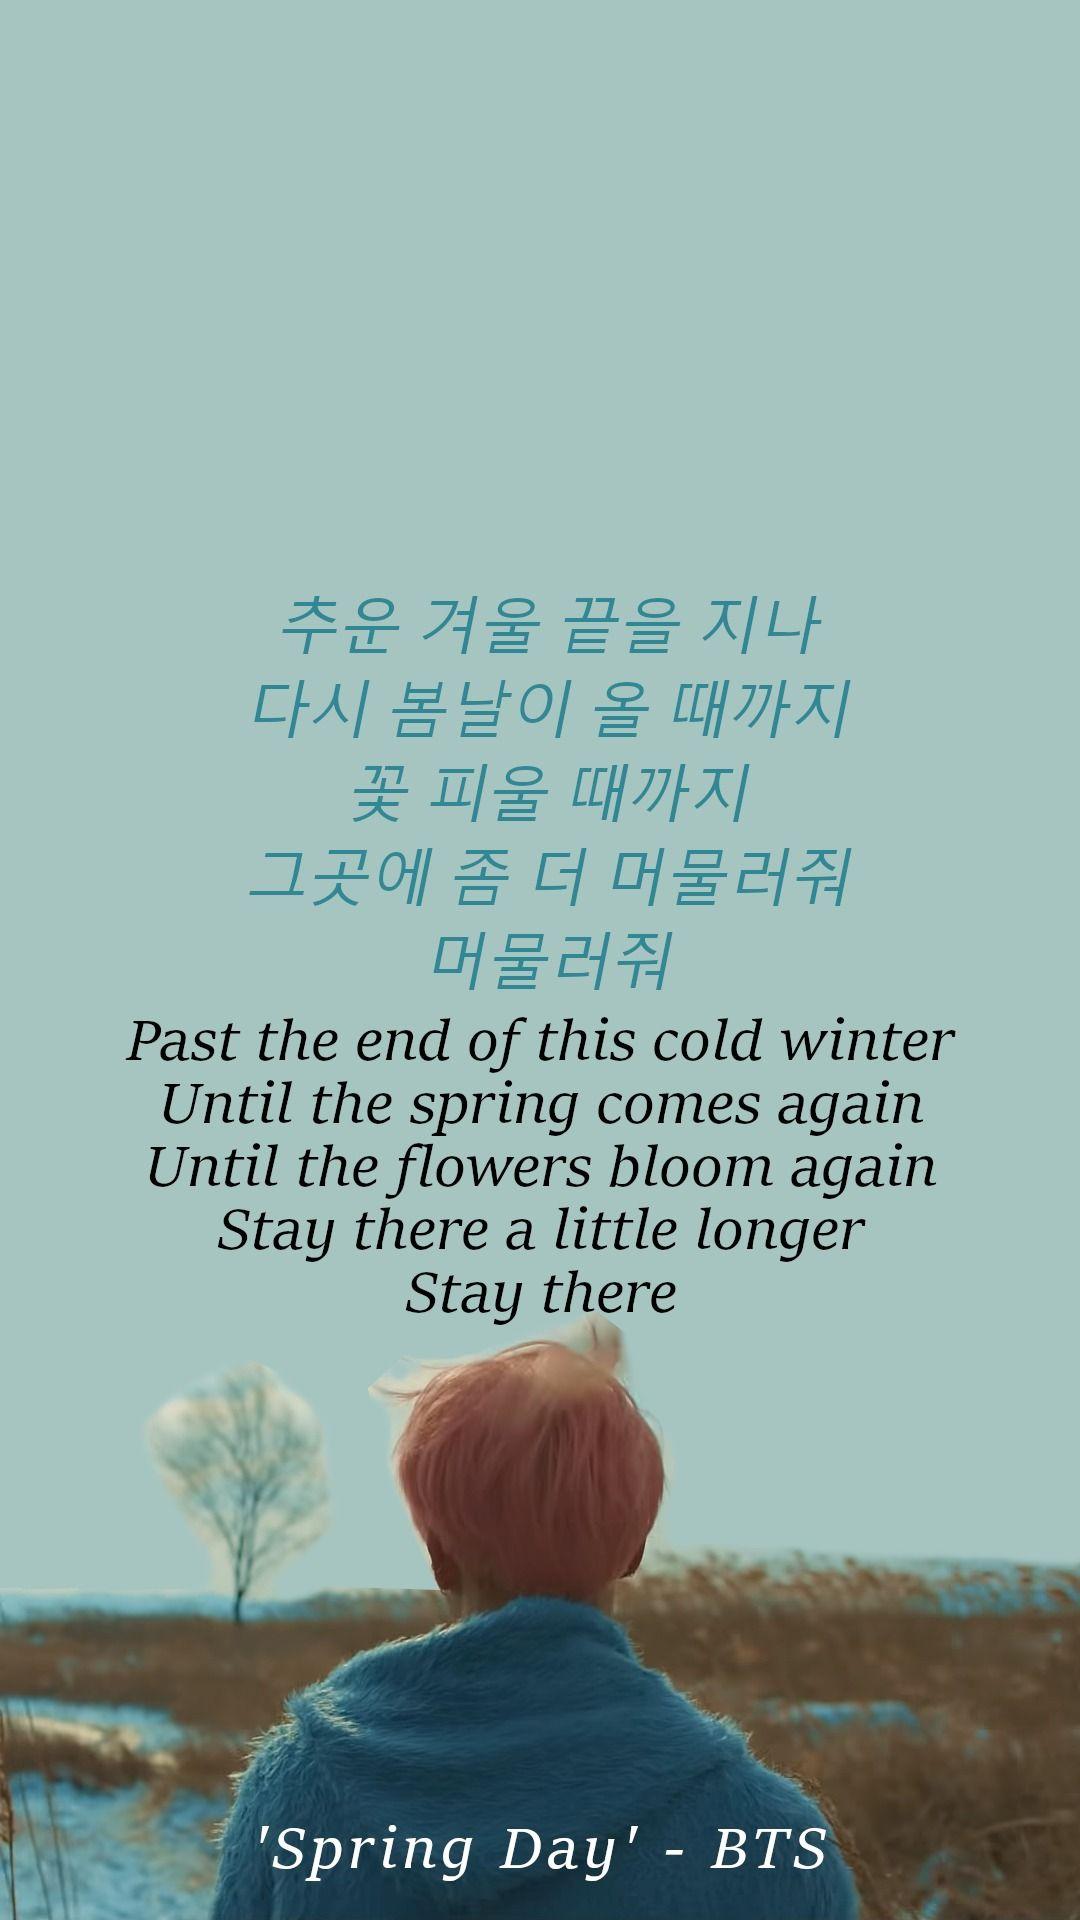 BTS Lockscreen Spring Day Lyrics Bts lyrics quotes